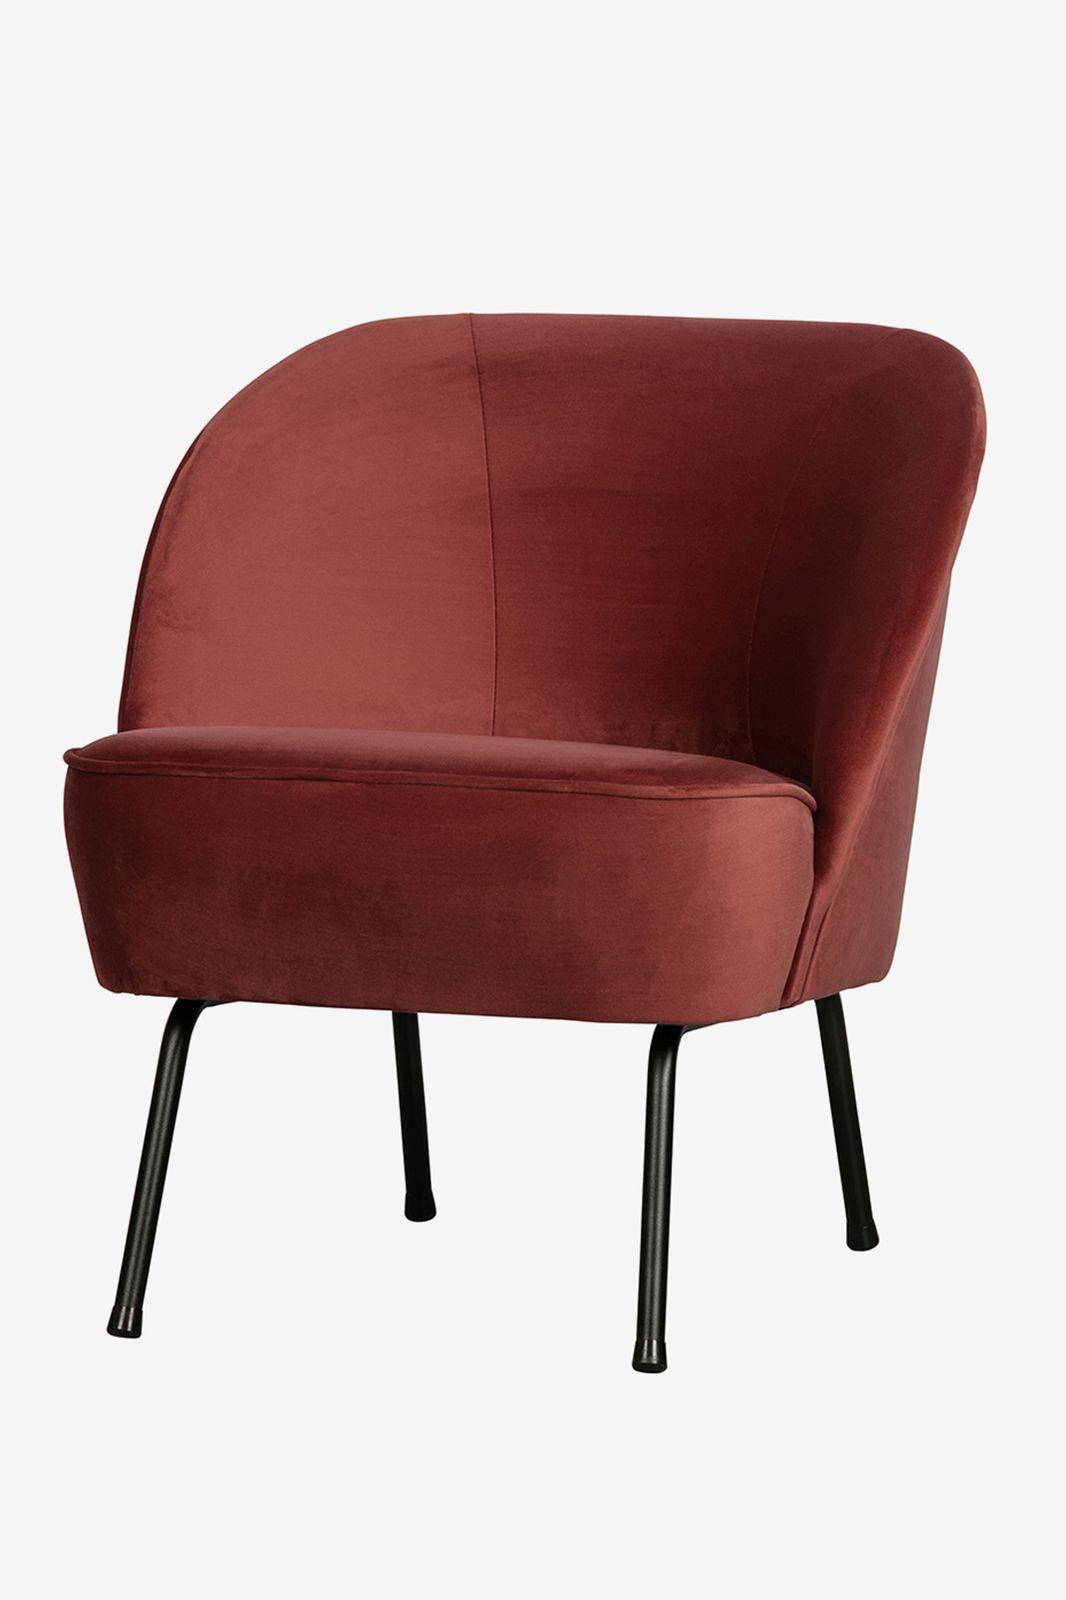 BePureHome Vogue fauteuil fluweel bruin - Homeland | Sissy-Boy